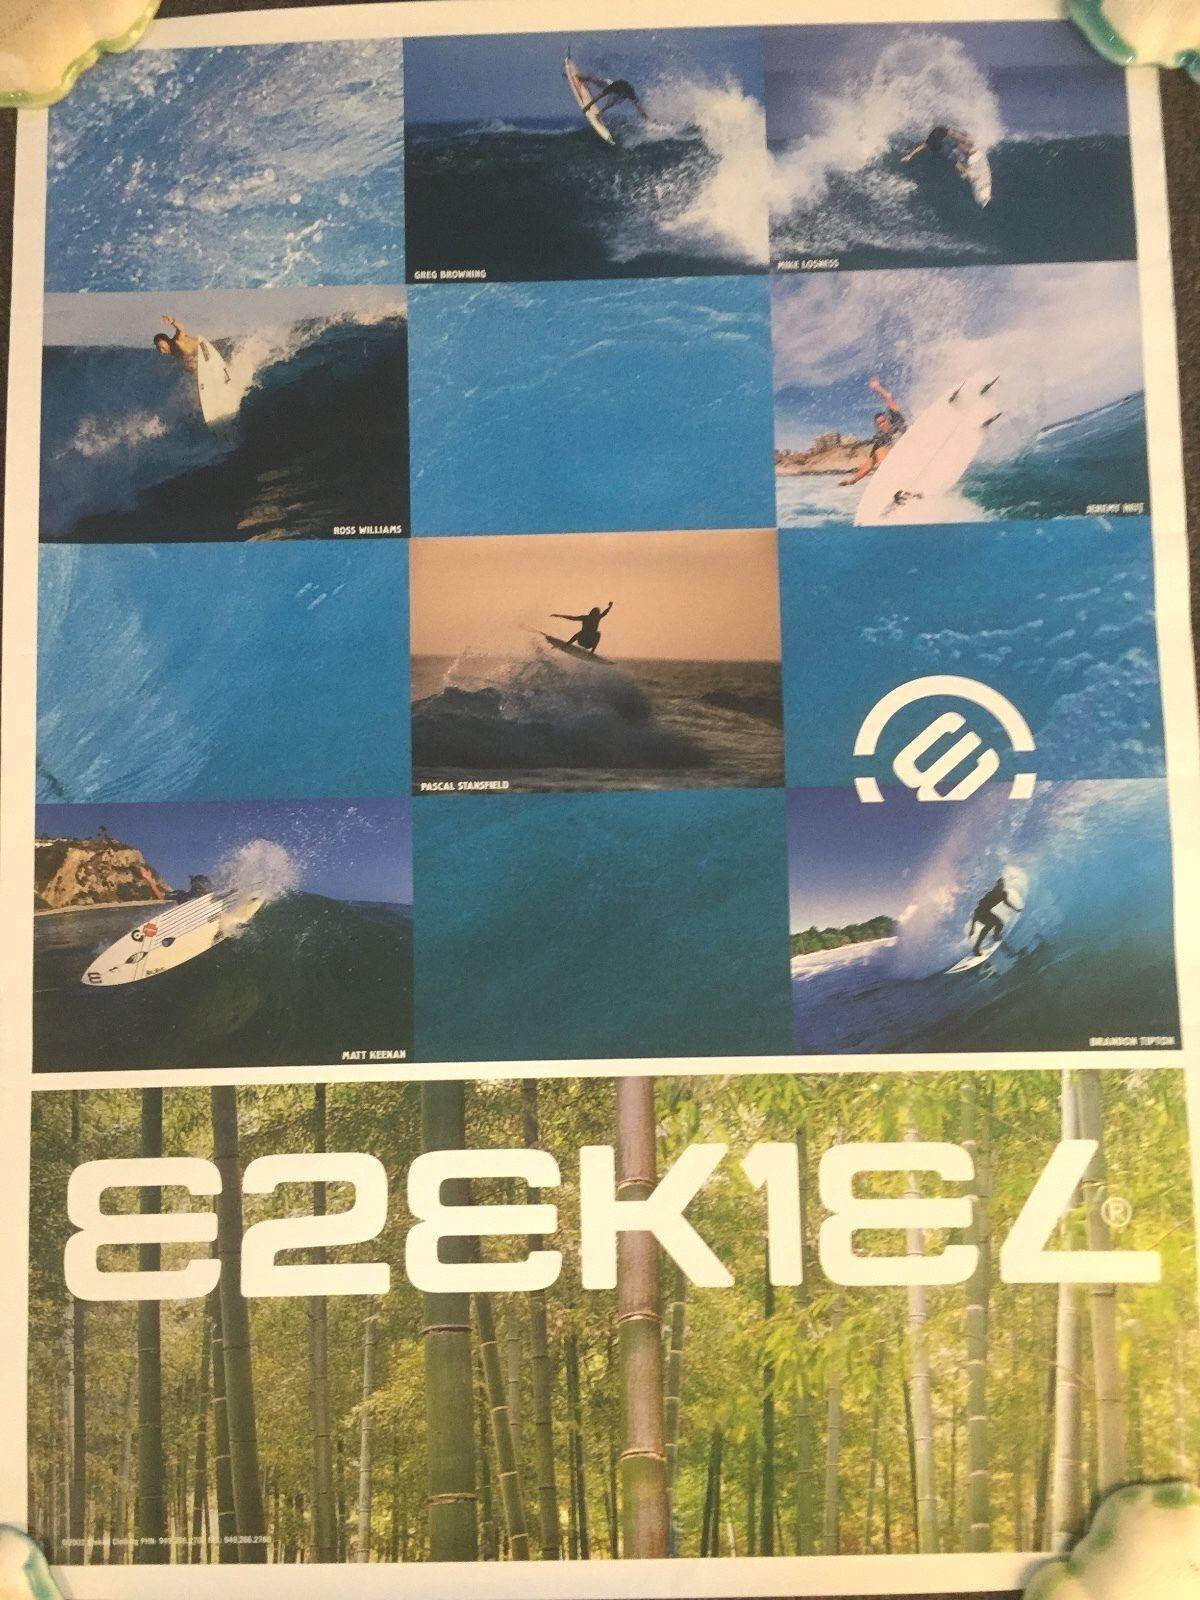 Ezequiel 2003 Surf Foto Poster marróning Losness Williams Heit Stansfield Keenan